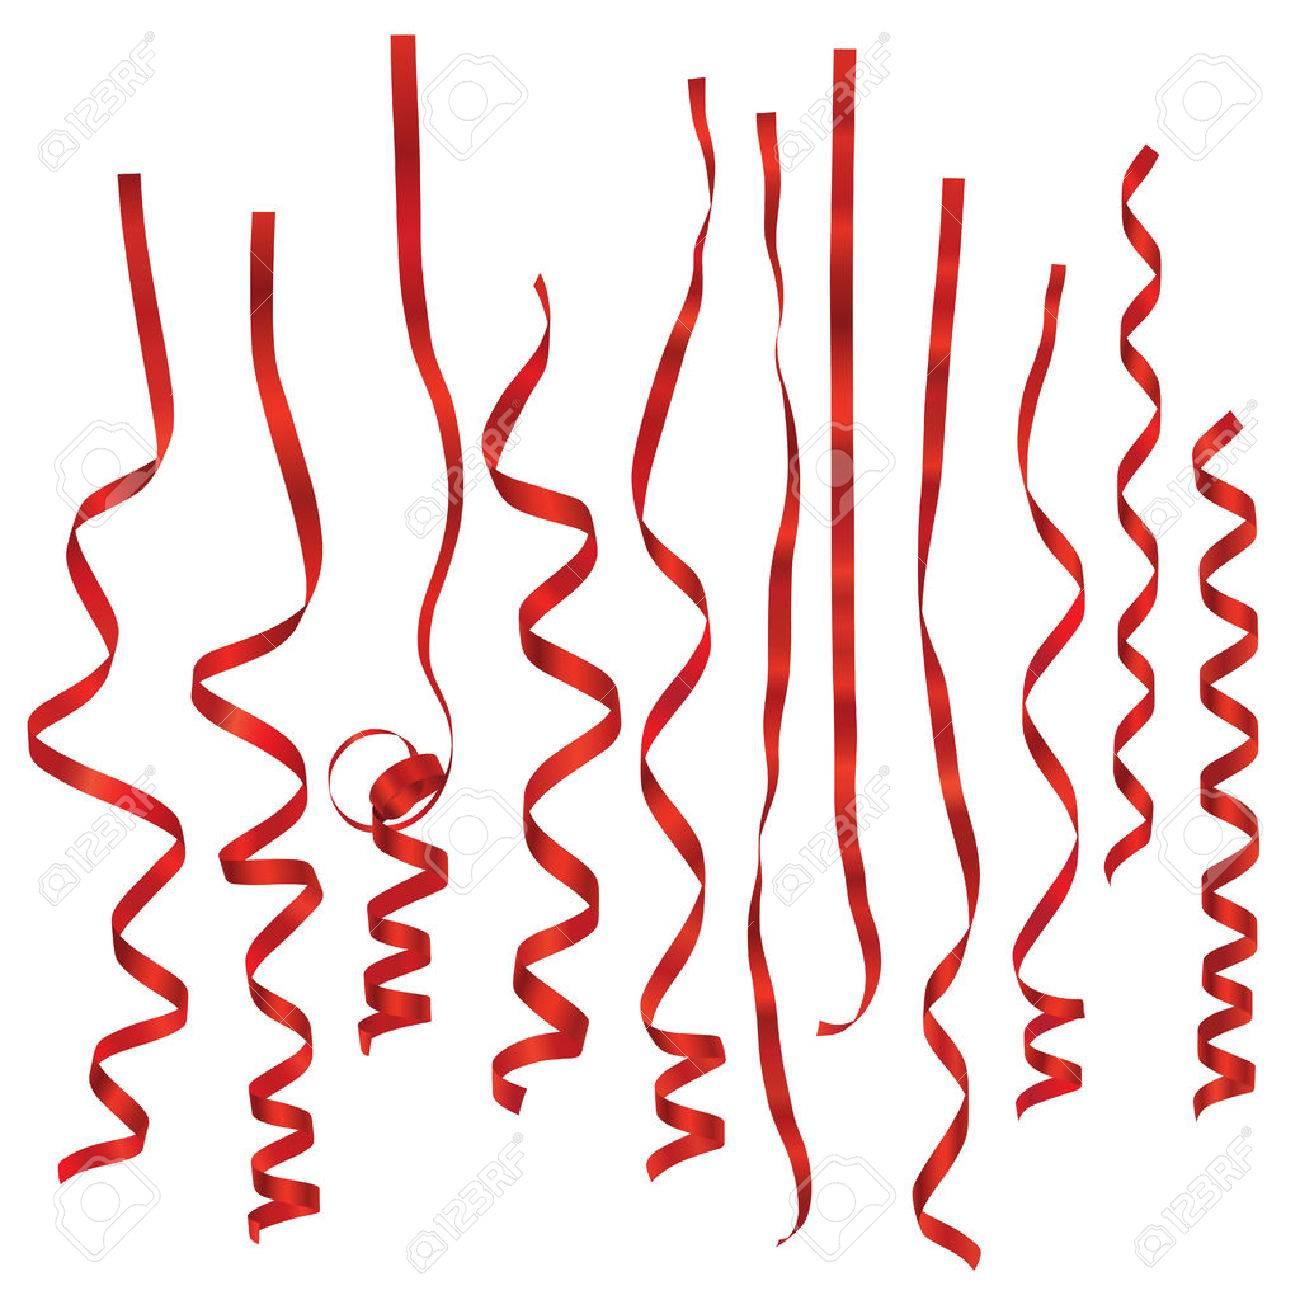 ribbons set - 33096968